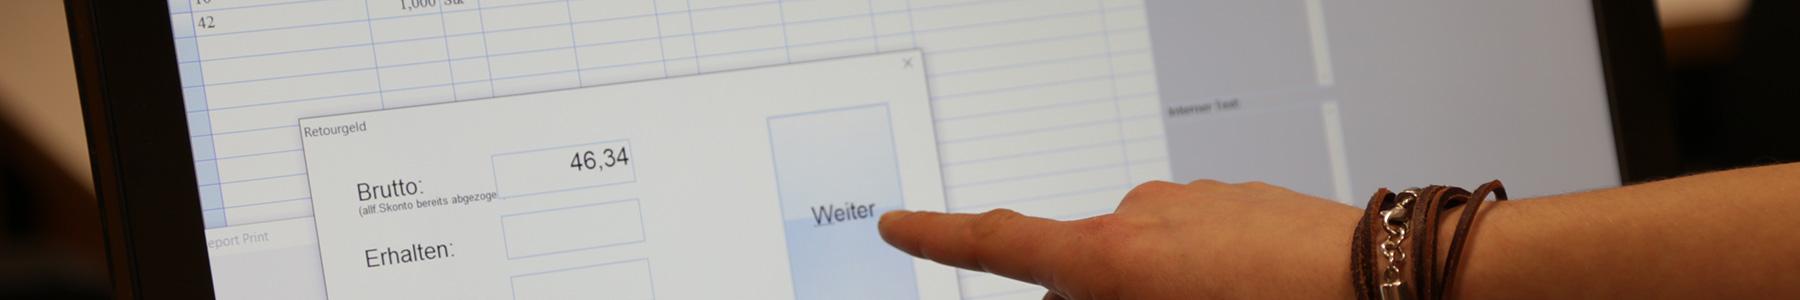 waldsoft Registrierkassenfunktion